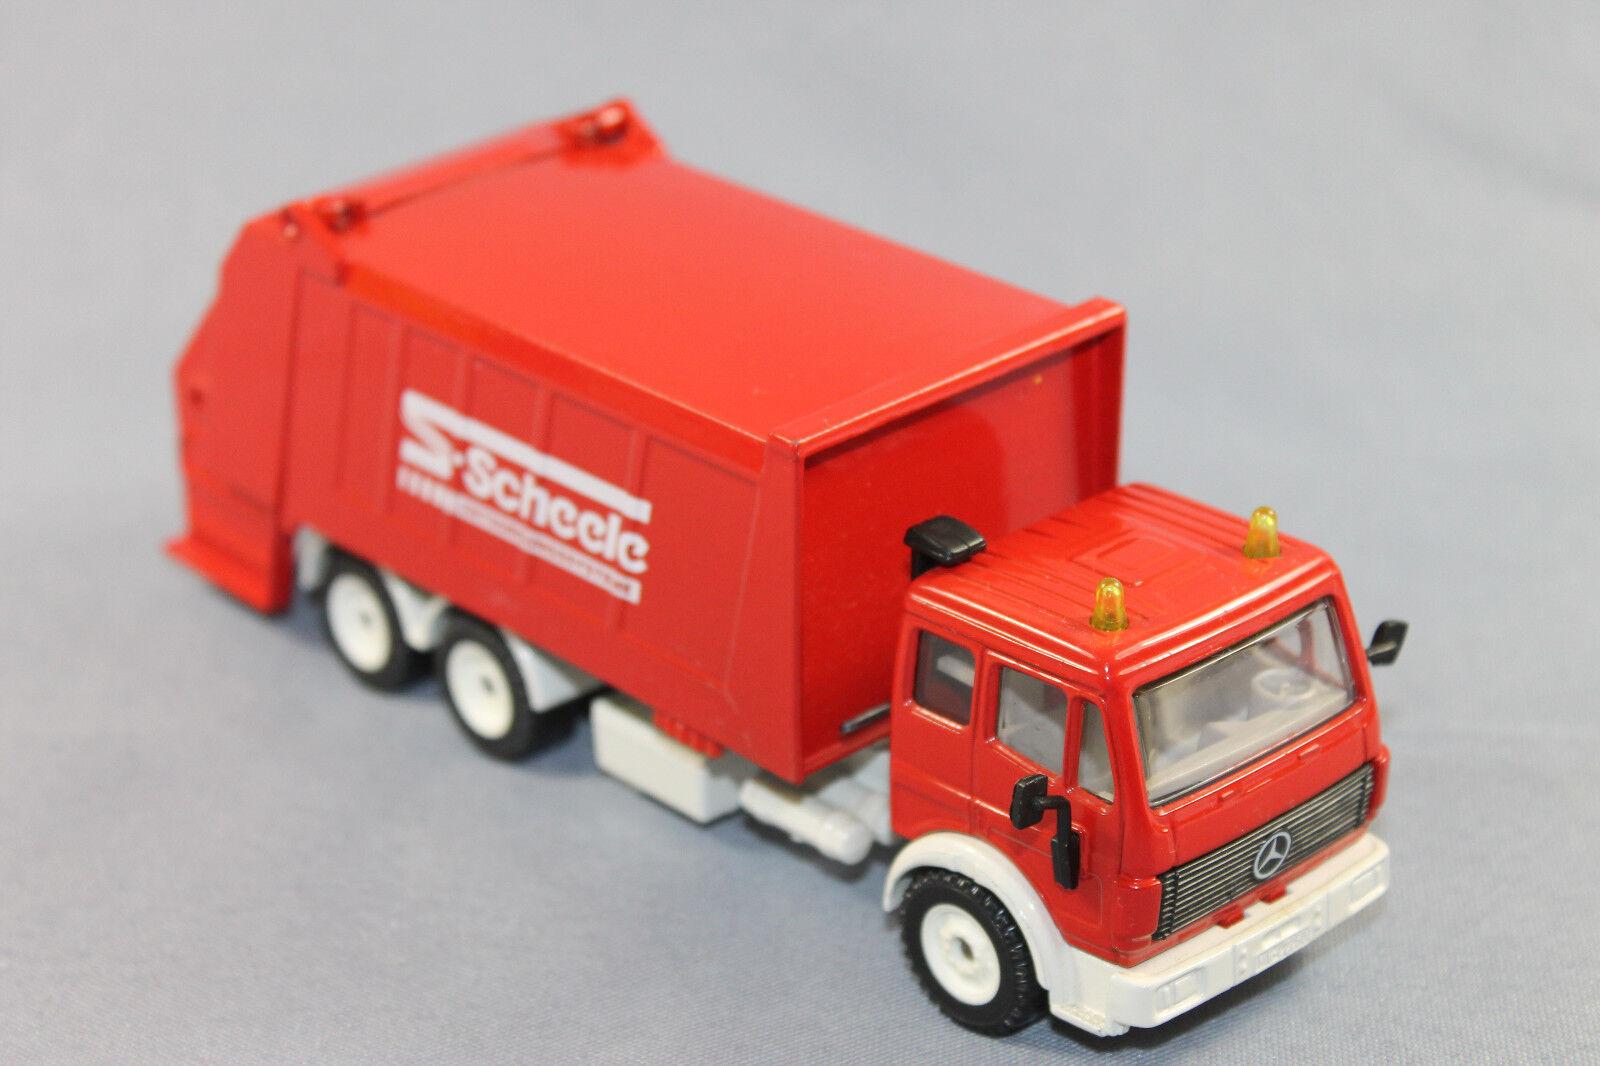 Siku 2926 Mercedes Benz Müllwagen Scheele Sondermodell Super-Serie Maßstab 1 55